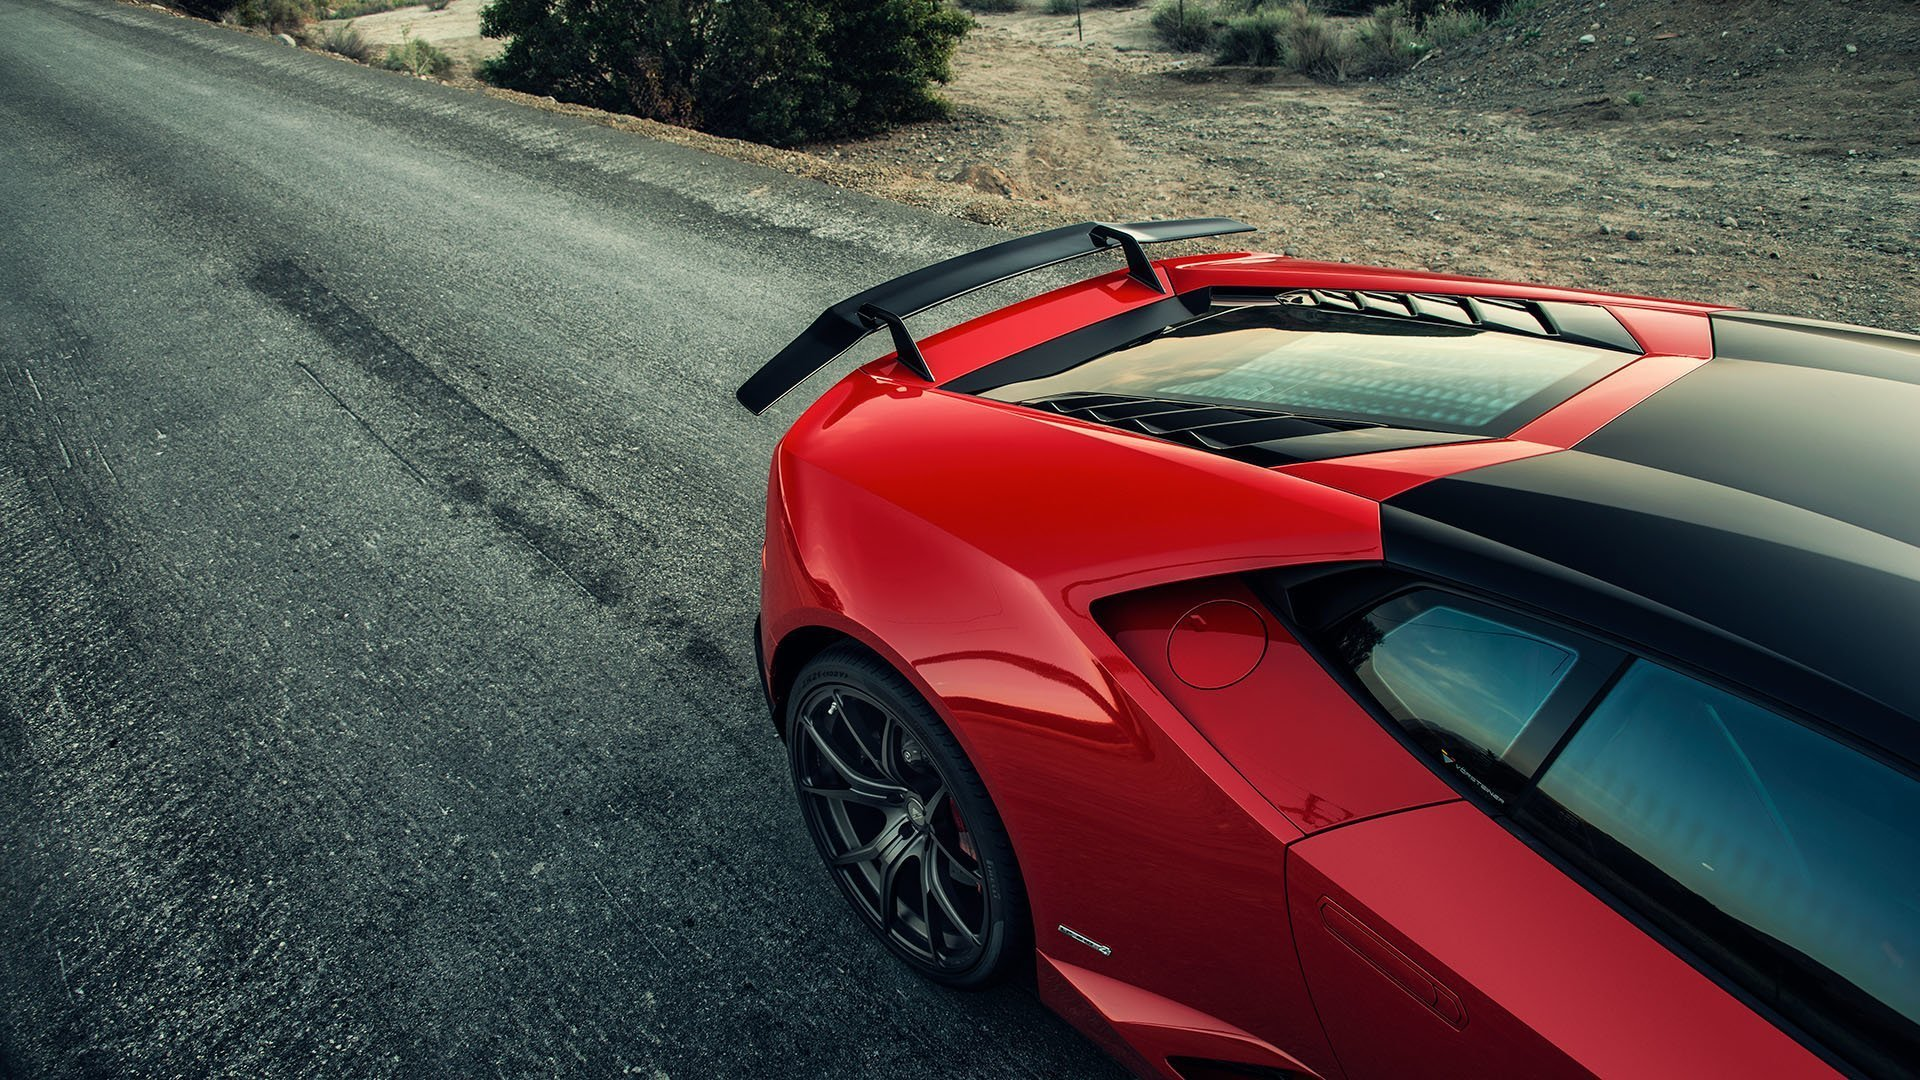 Карбоновое антикрыло Vorsteiner Style для Lamborghini Huracan